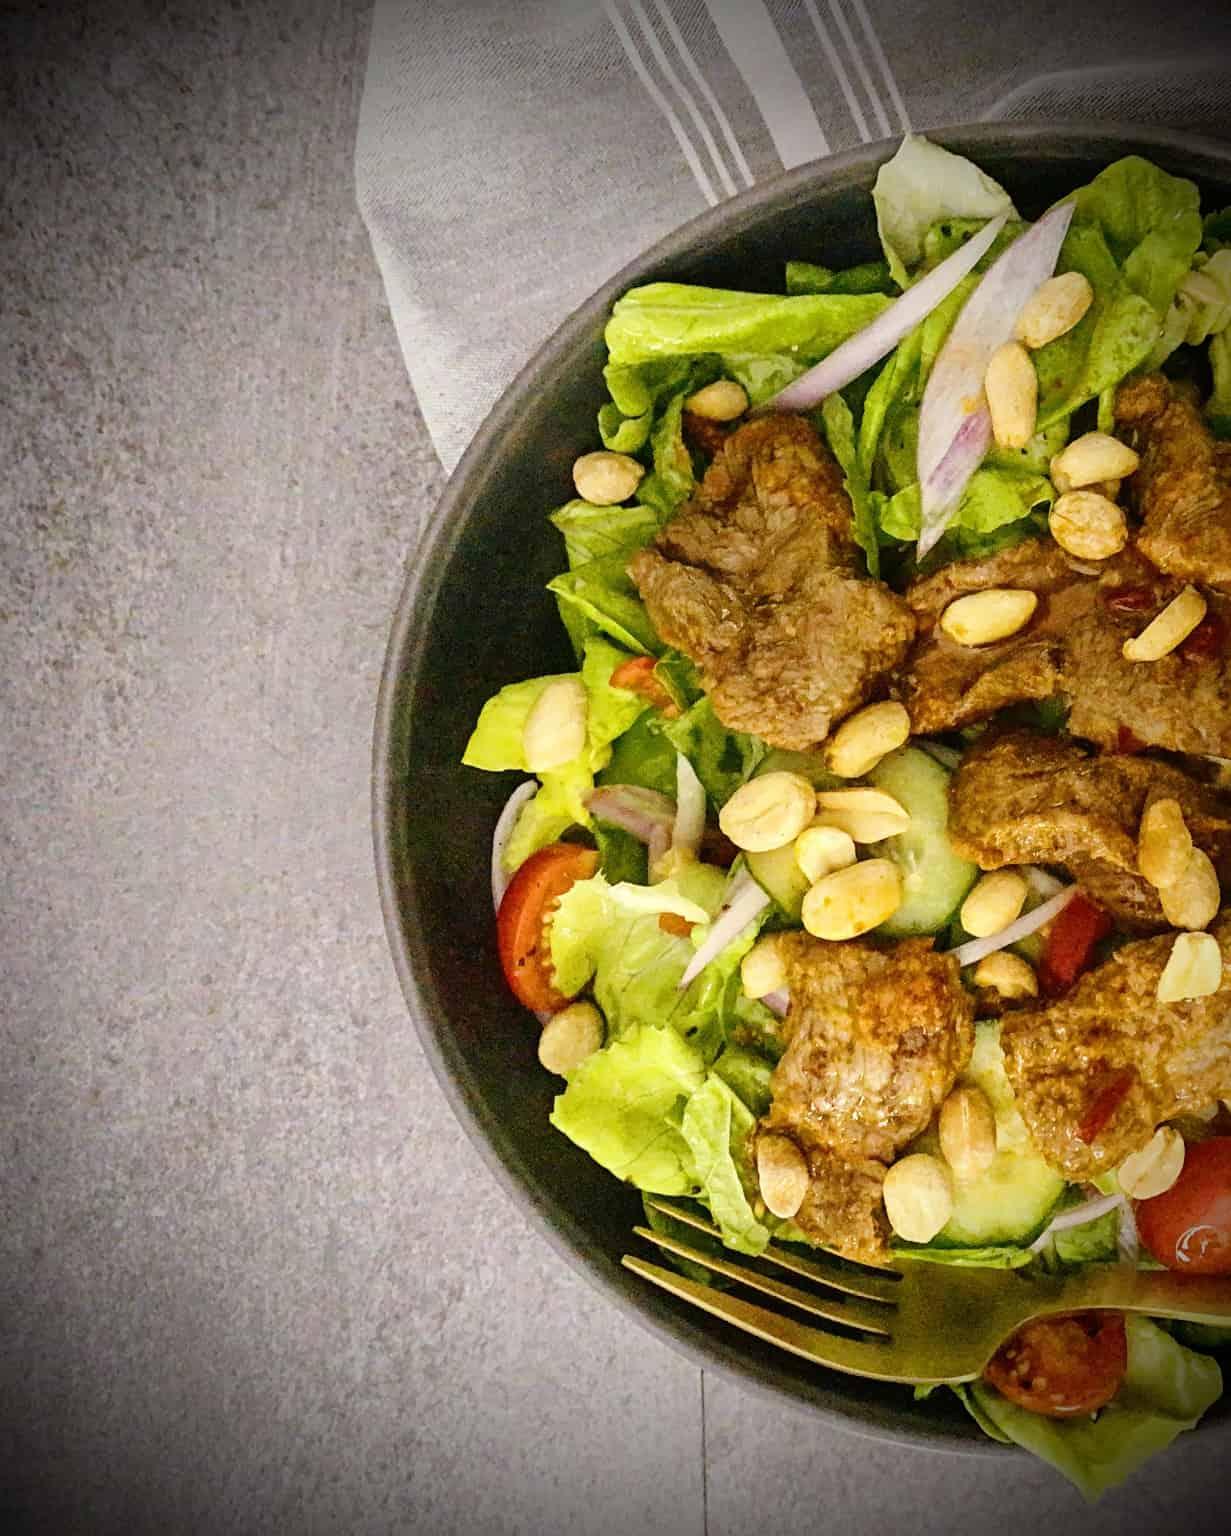 Gobble's Spicy Thai Beef Salad